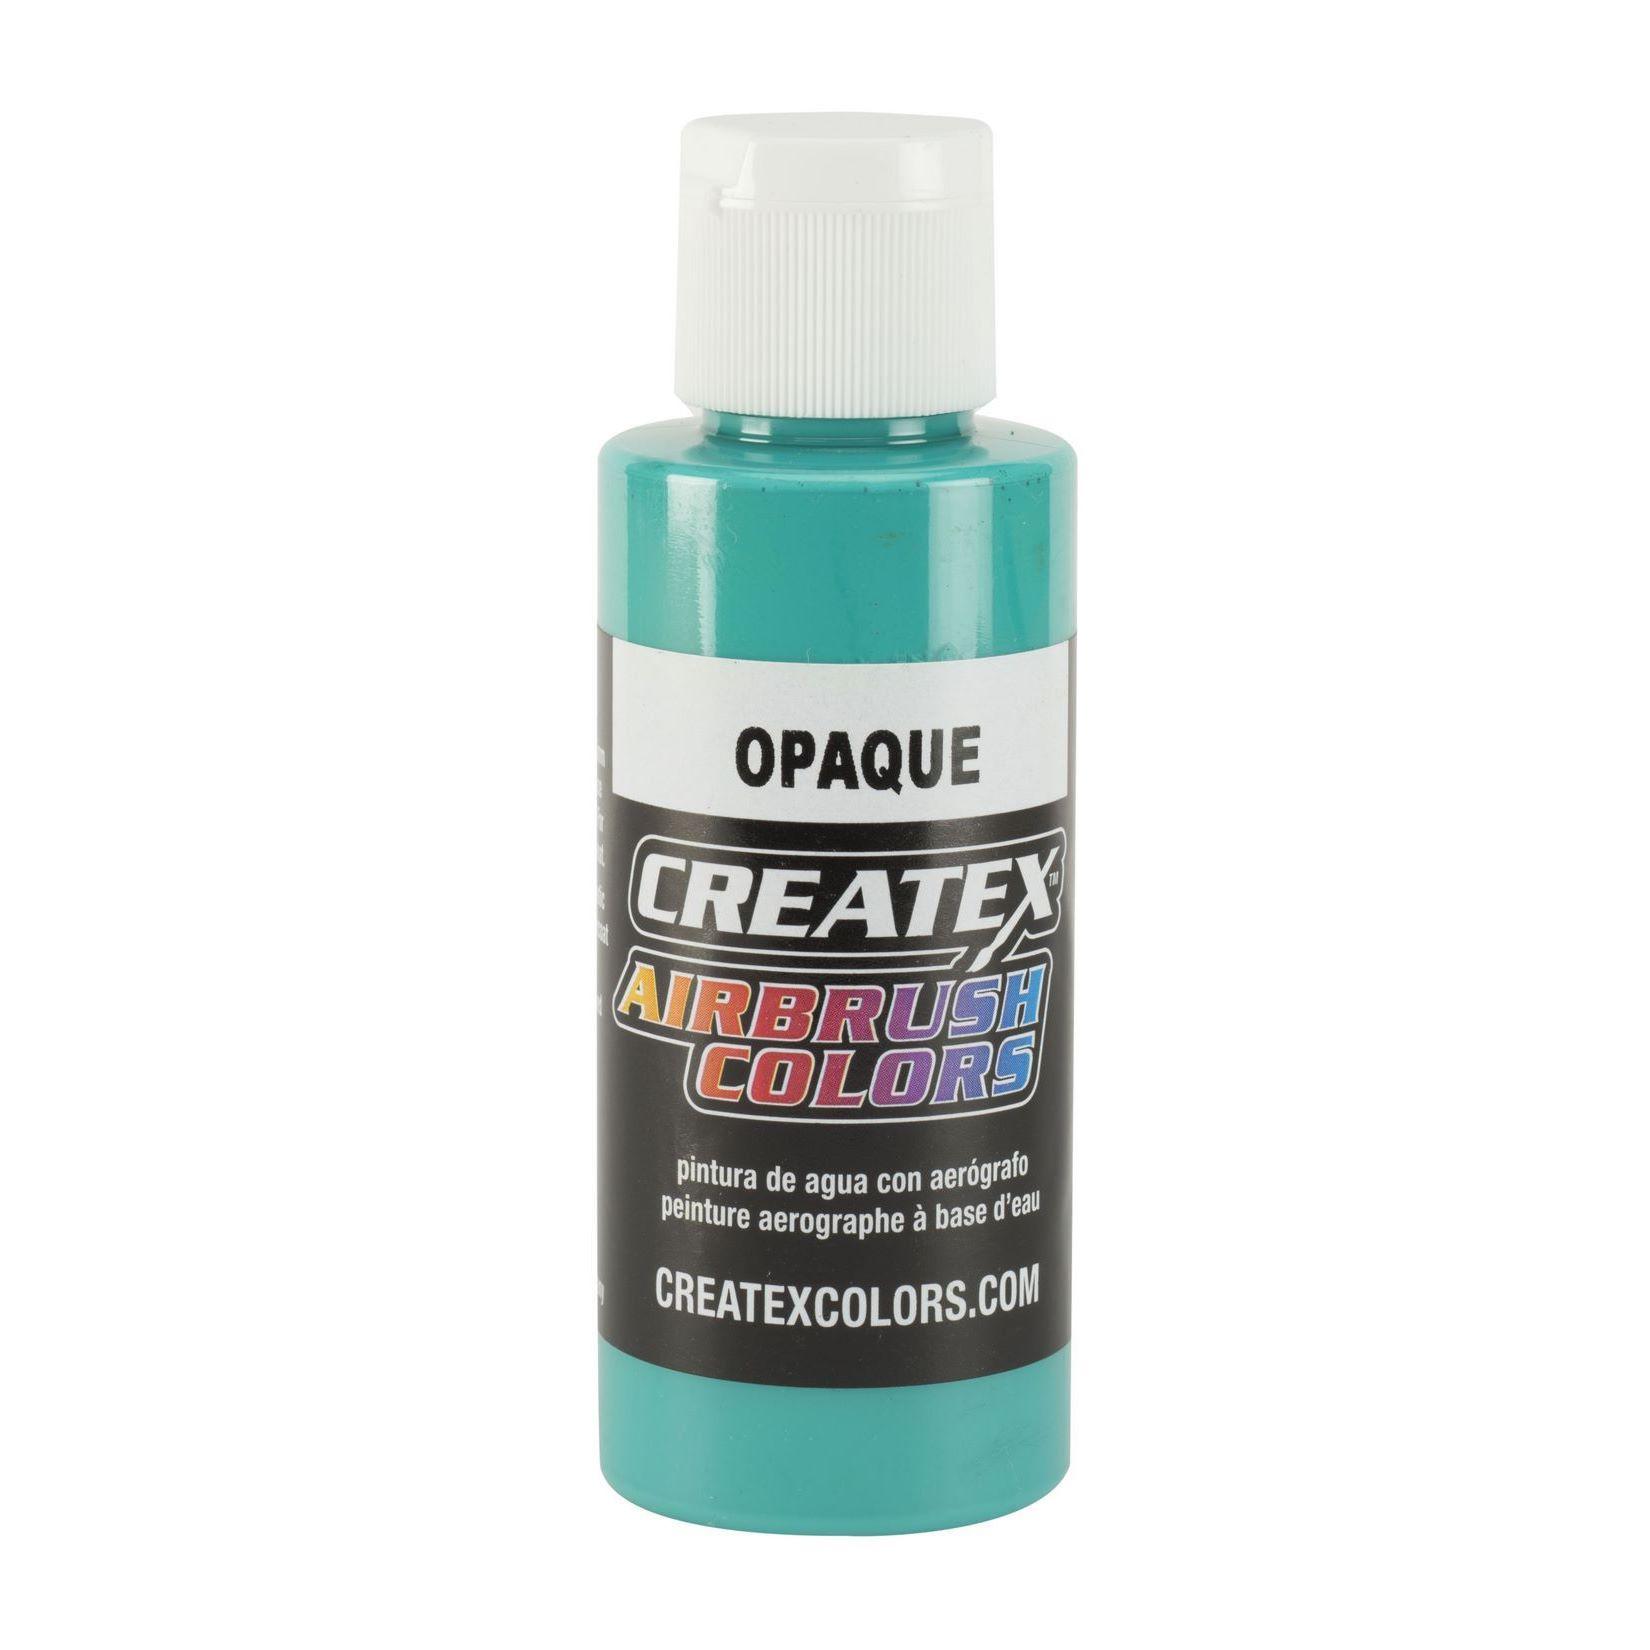 opaque aqua Createx Airbrush Colors Farbe 60ml 11 5206 Createx